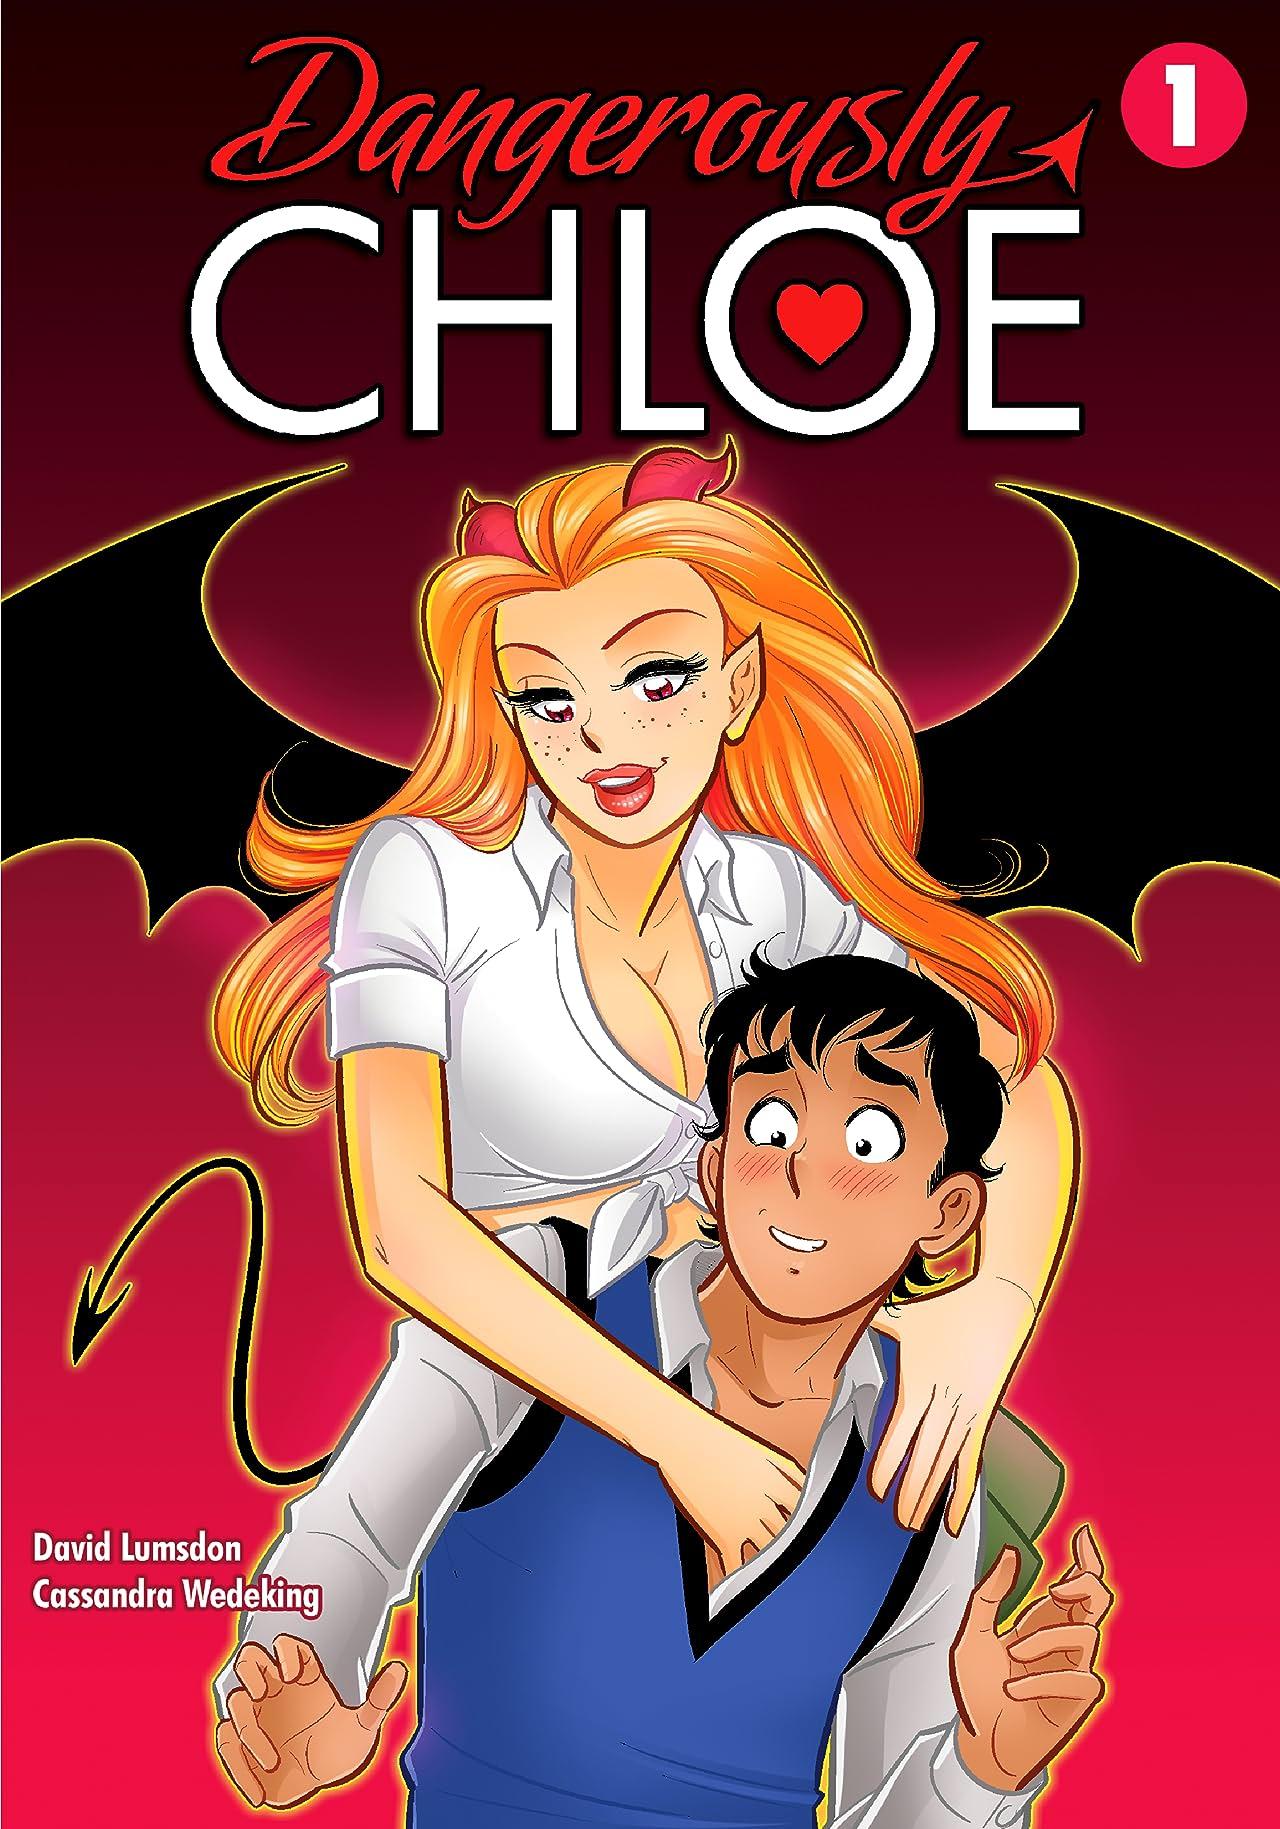 Dangerously Chloe Vol. 1